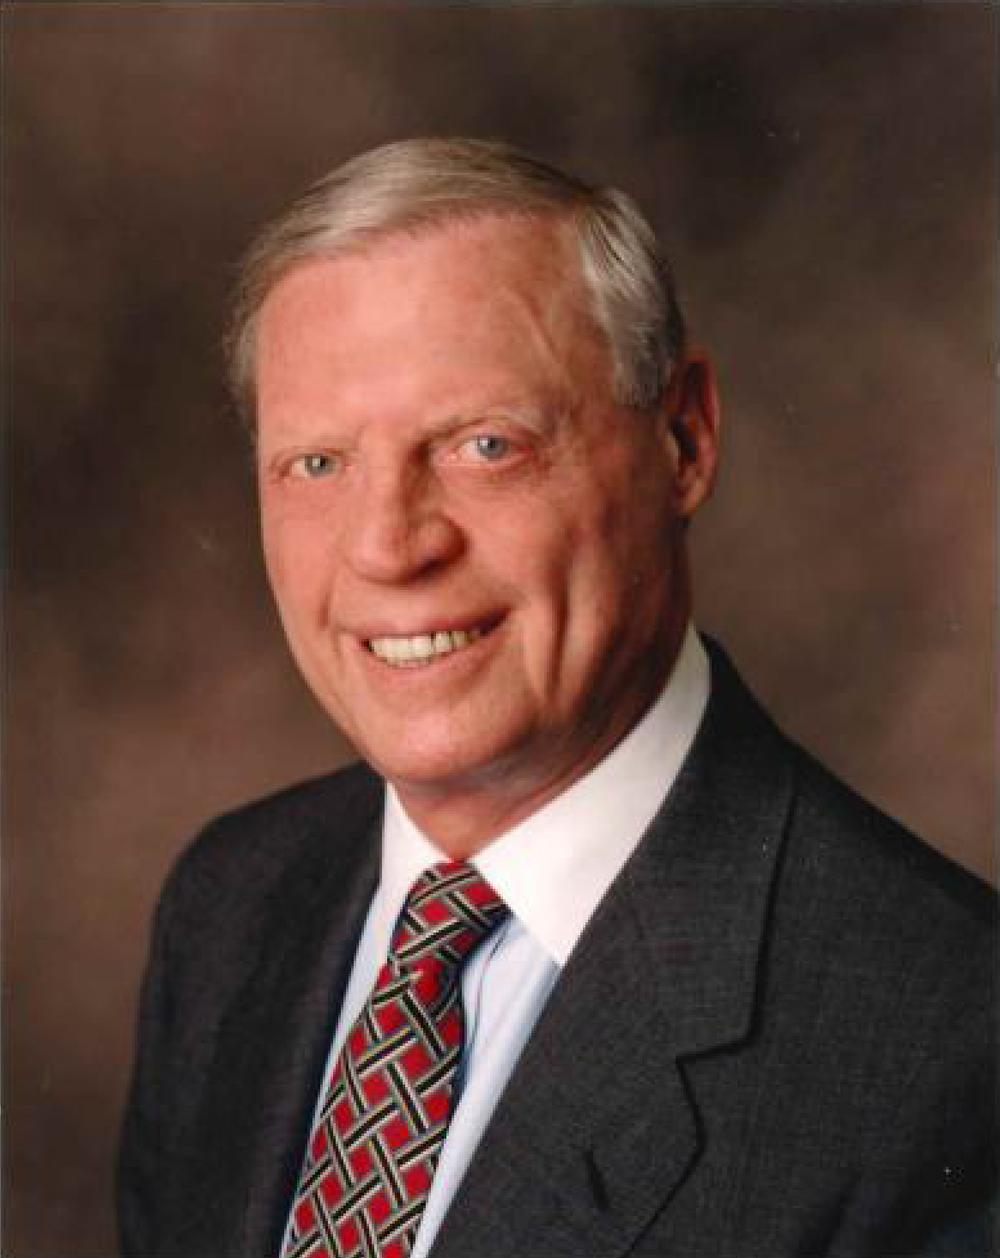 Joseph B. Gildenhorn | Founding Partner, JBG Companies